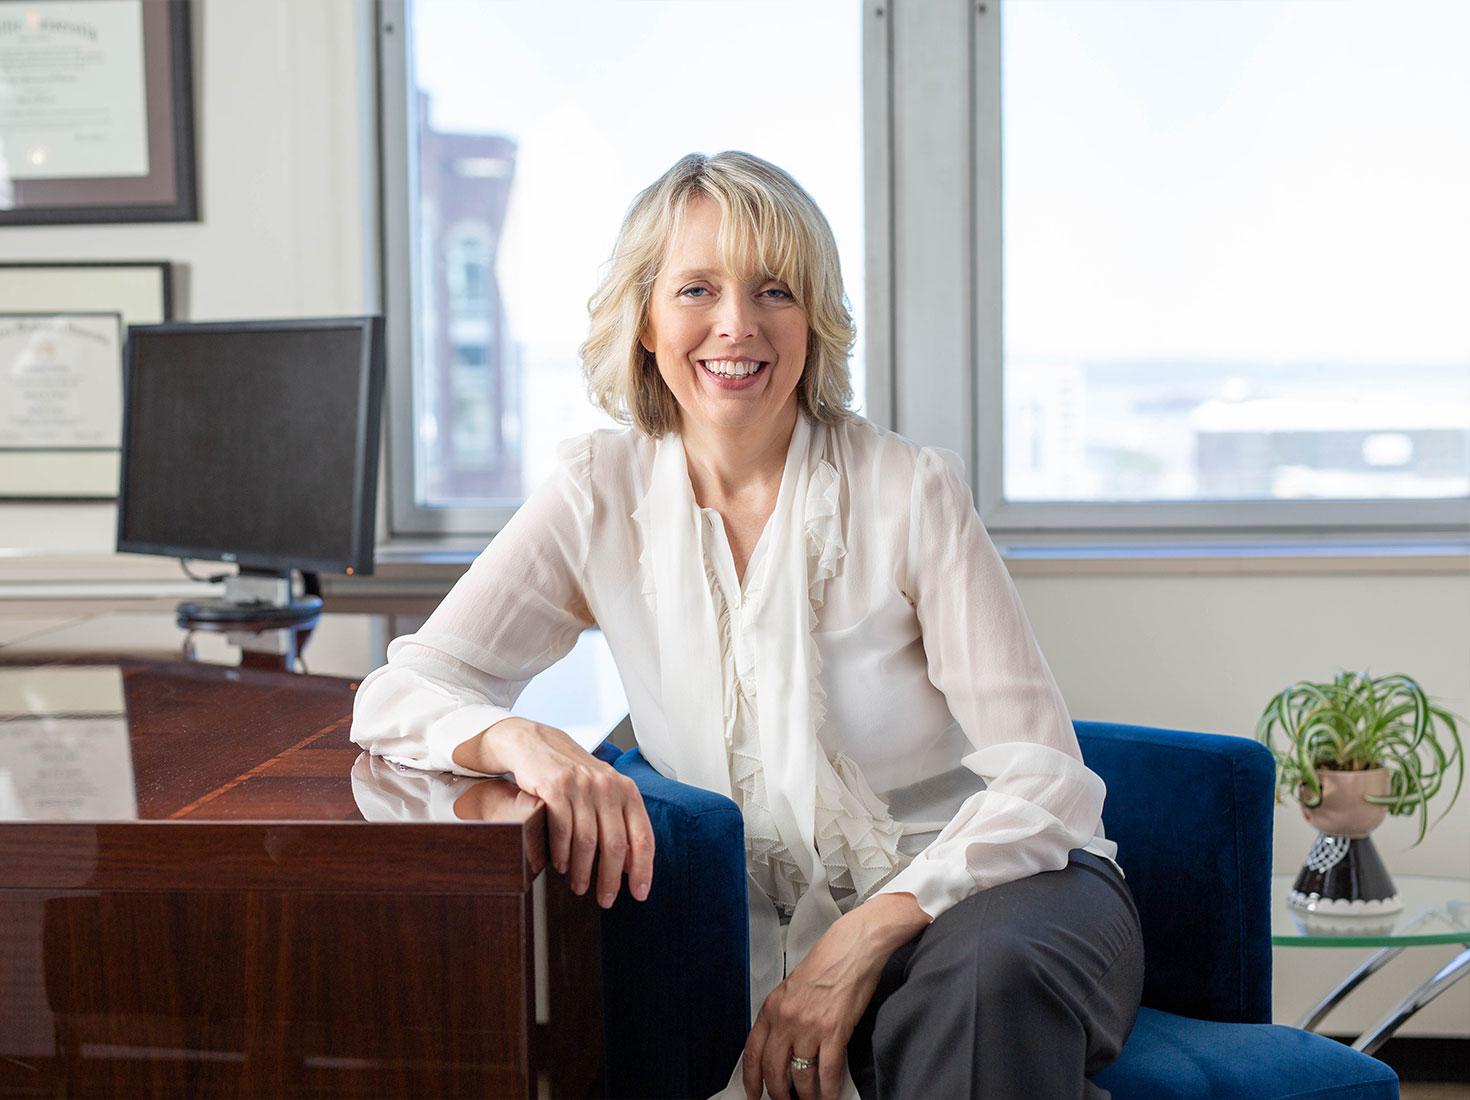 Michelle O'Loane sitting in her office.